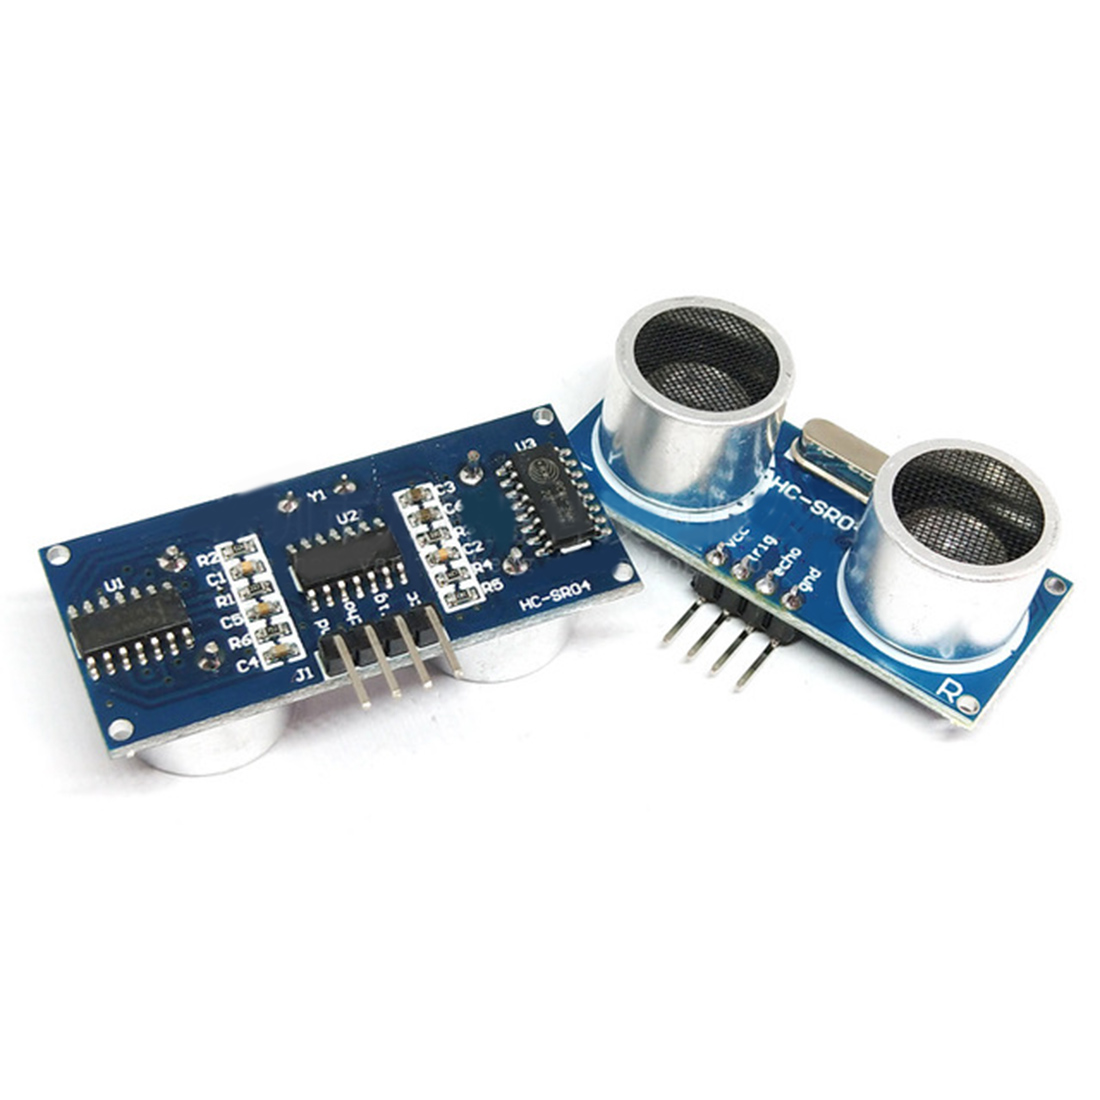 HC-SR04 Ultrasonic Module Ultrasonic Sensor Distance Measuring Transducer For DIY Programming Robot Car